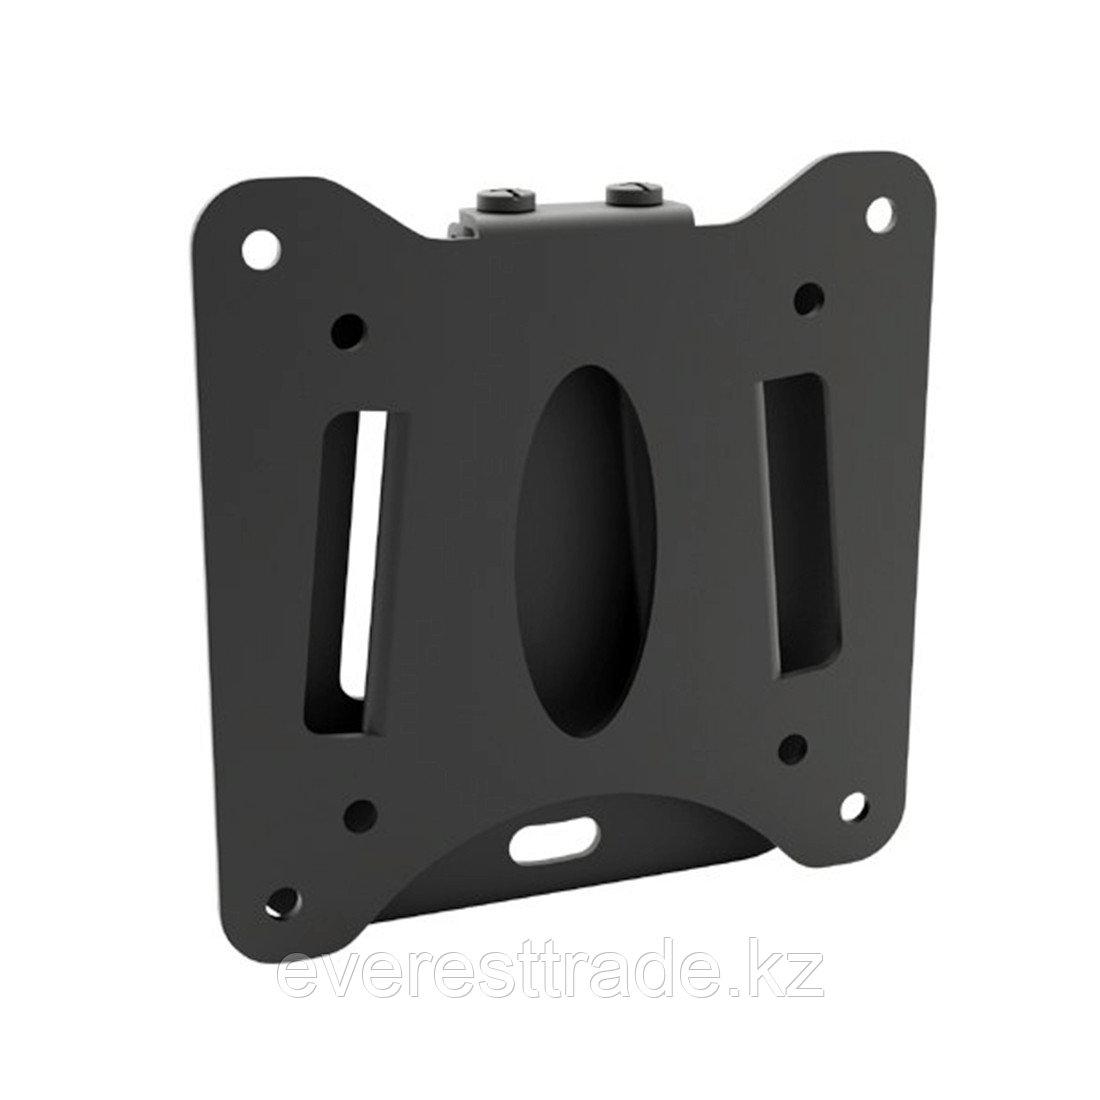 Brateck Крепление для ТВ и мониторов, Brateck, LCD-203, LCD-Series, до 30 кг, Диагональ 13-27